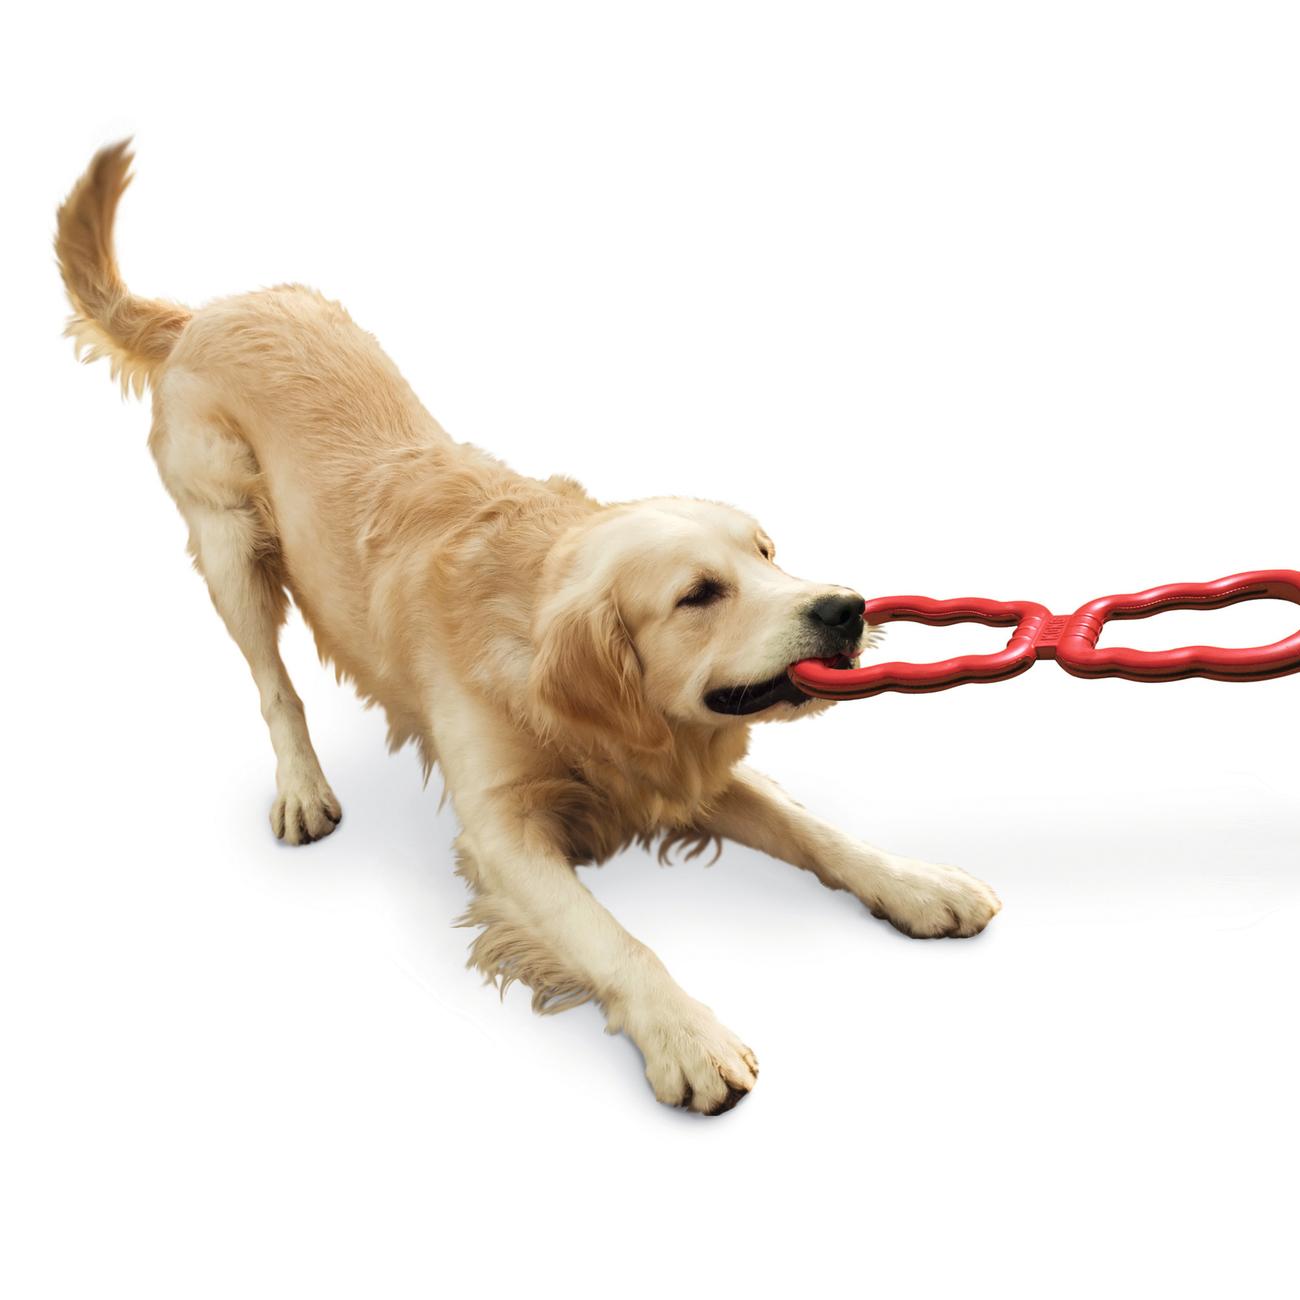 KONG Tug Toy Zerrspielzeug für Hunde, Bild 2